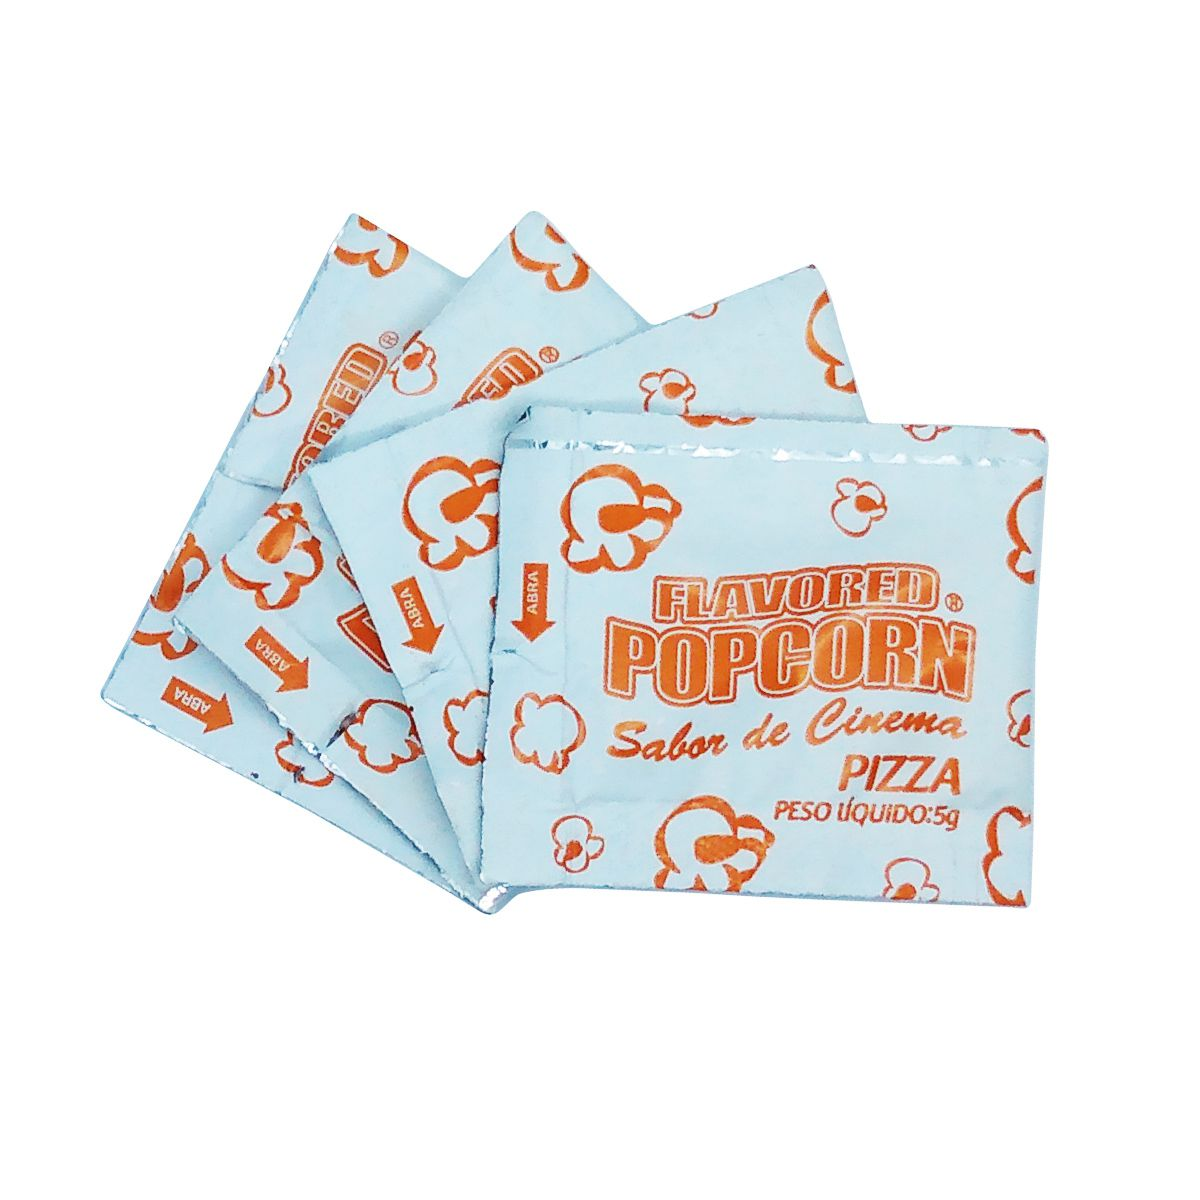 TemperoS Popcorn Sachês 5g - Pizza (100 unidades)